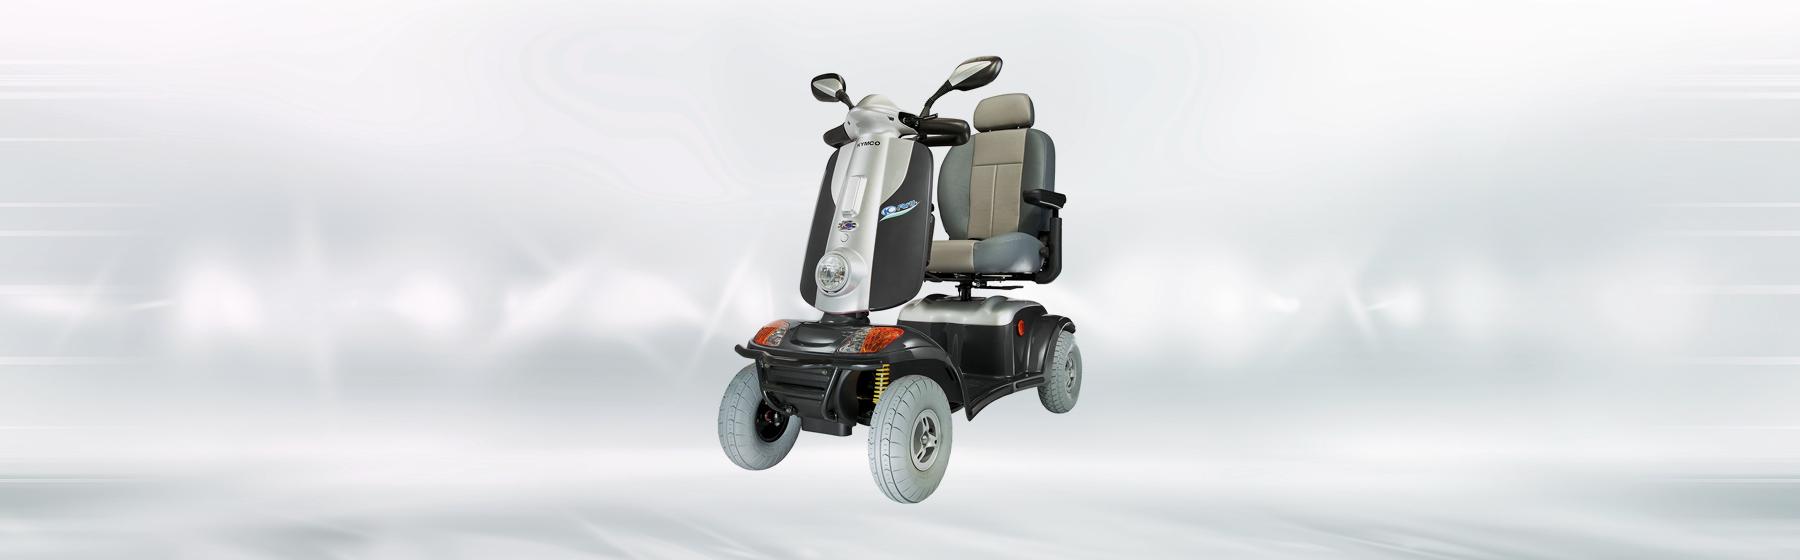 SMB-Mobilitaet-Rubrikenmotiv-Elektromobile